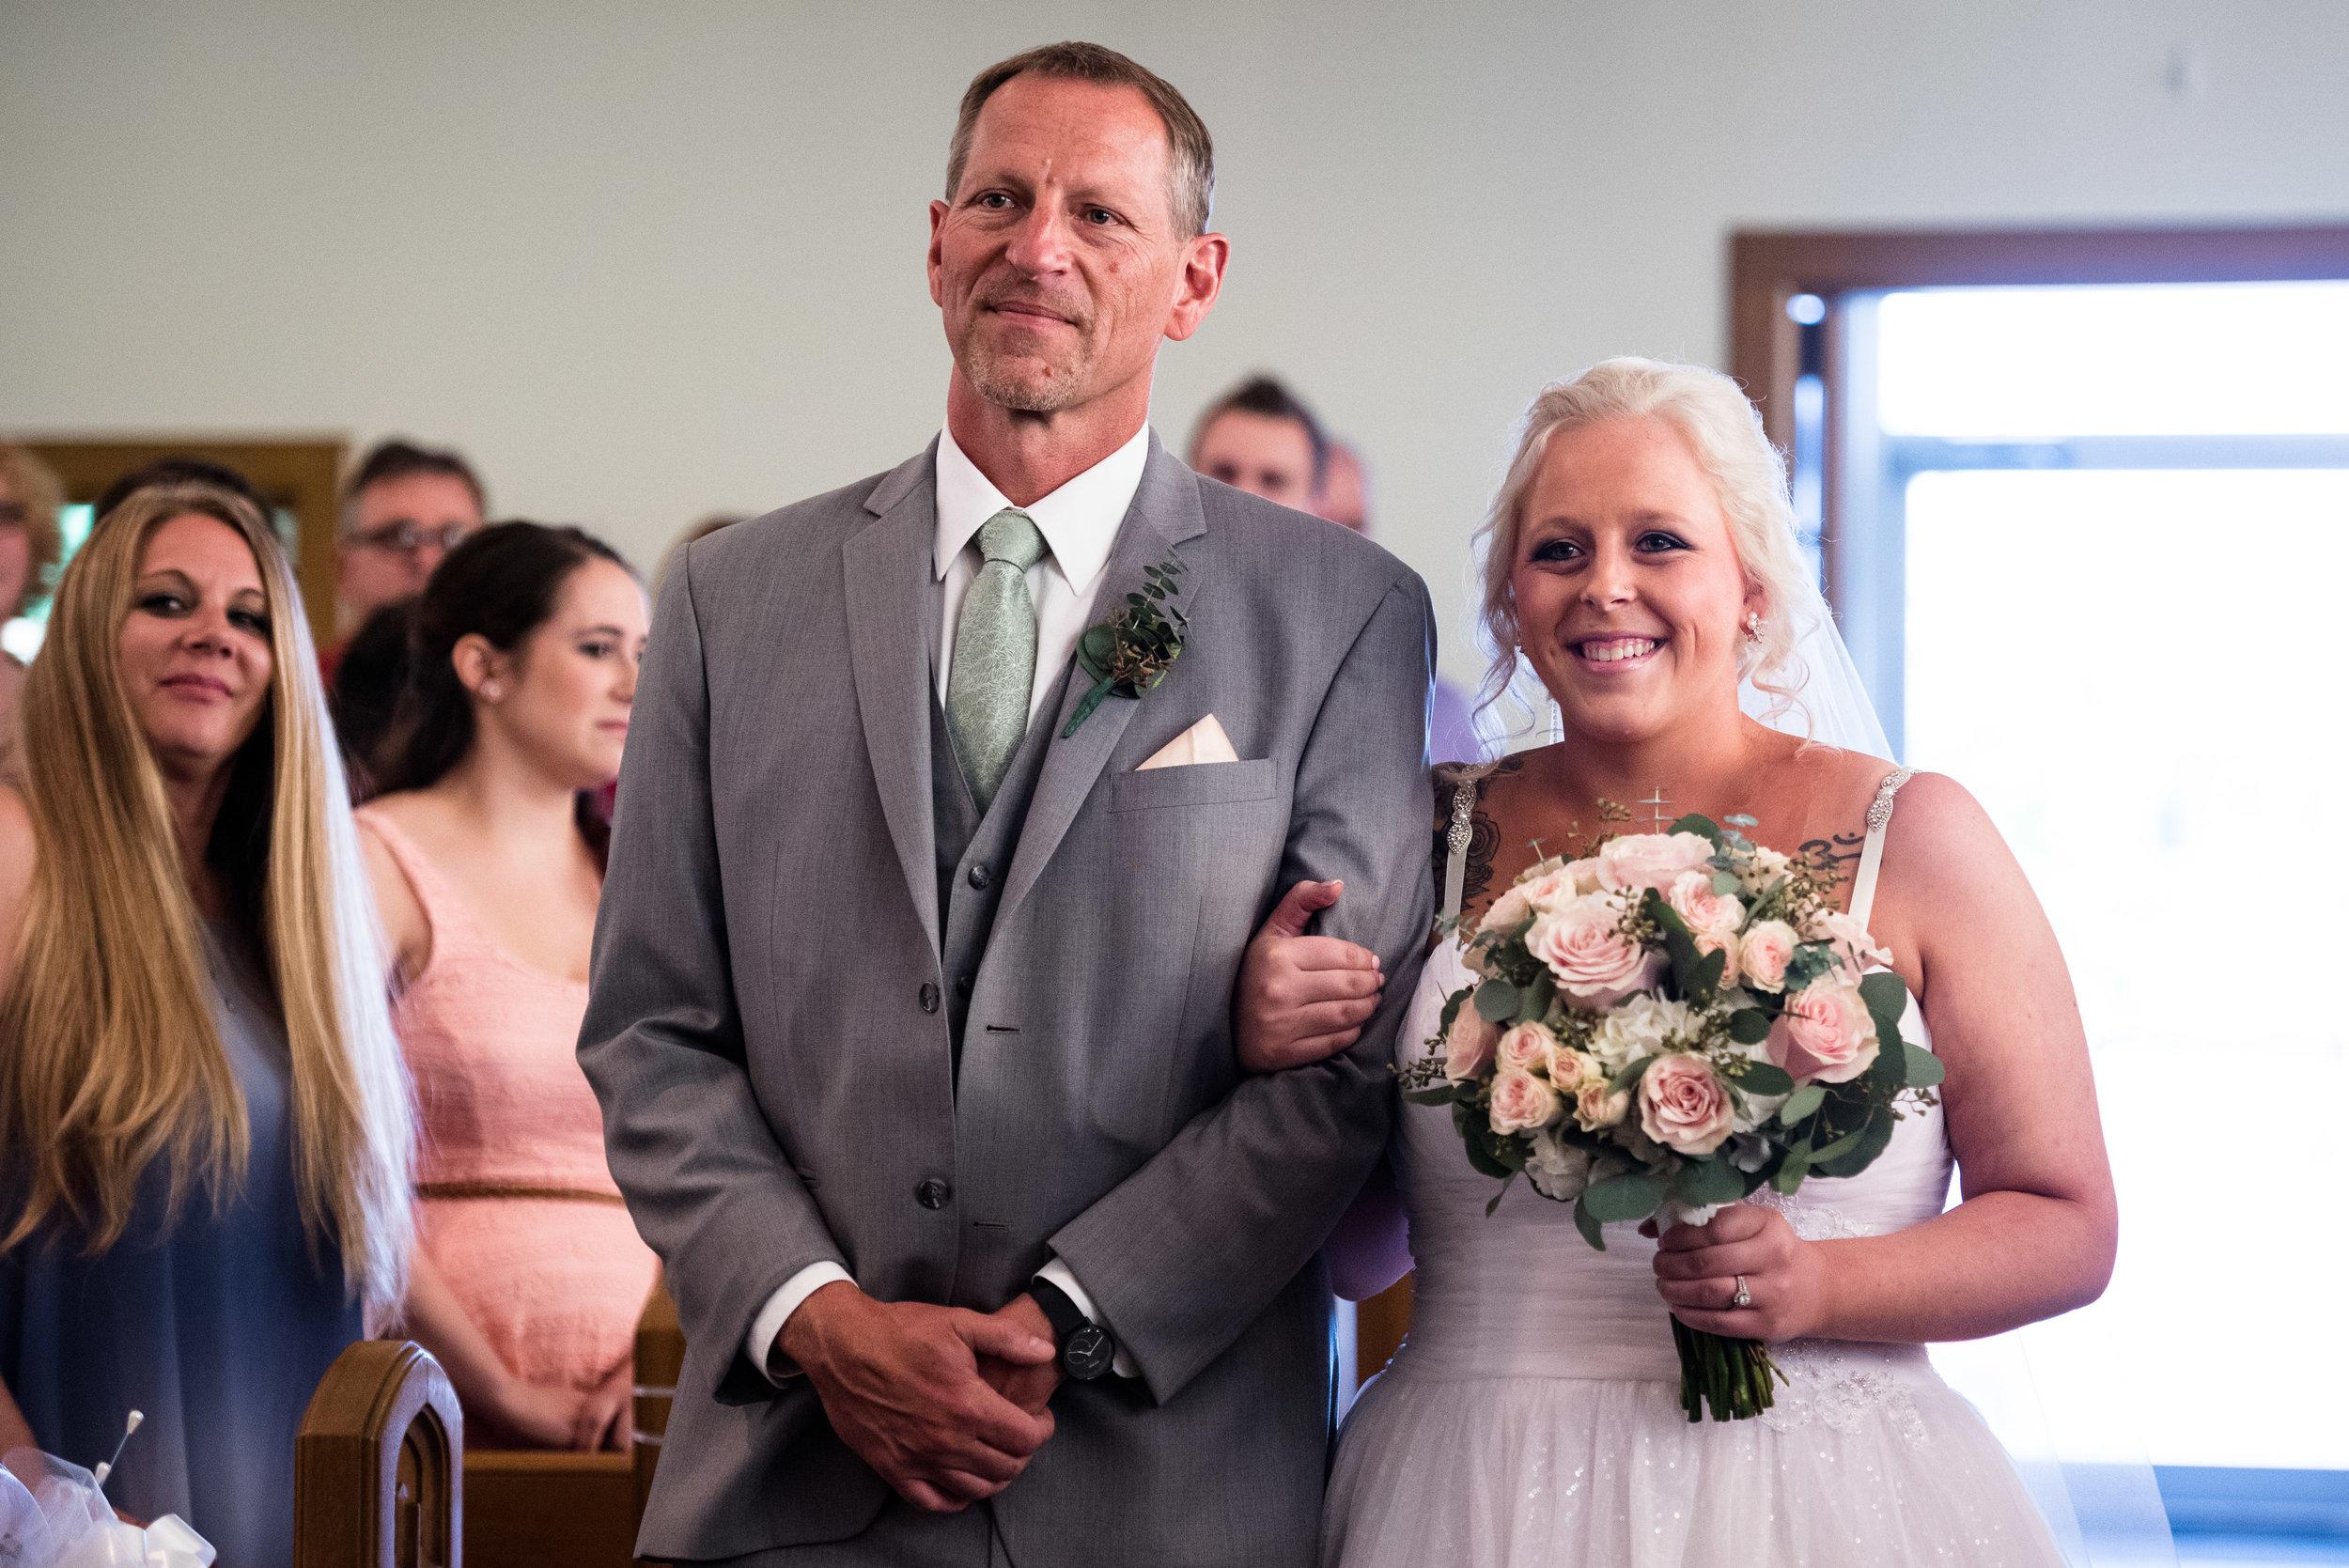 NORTHWEST OHIO WEDDING-18.jpg